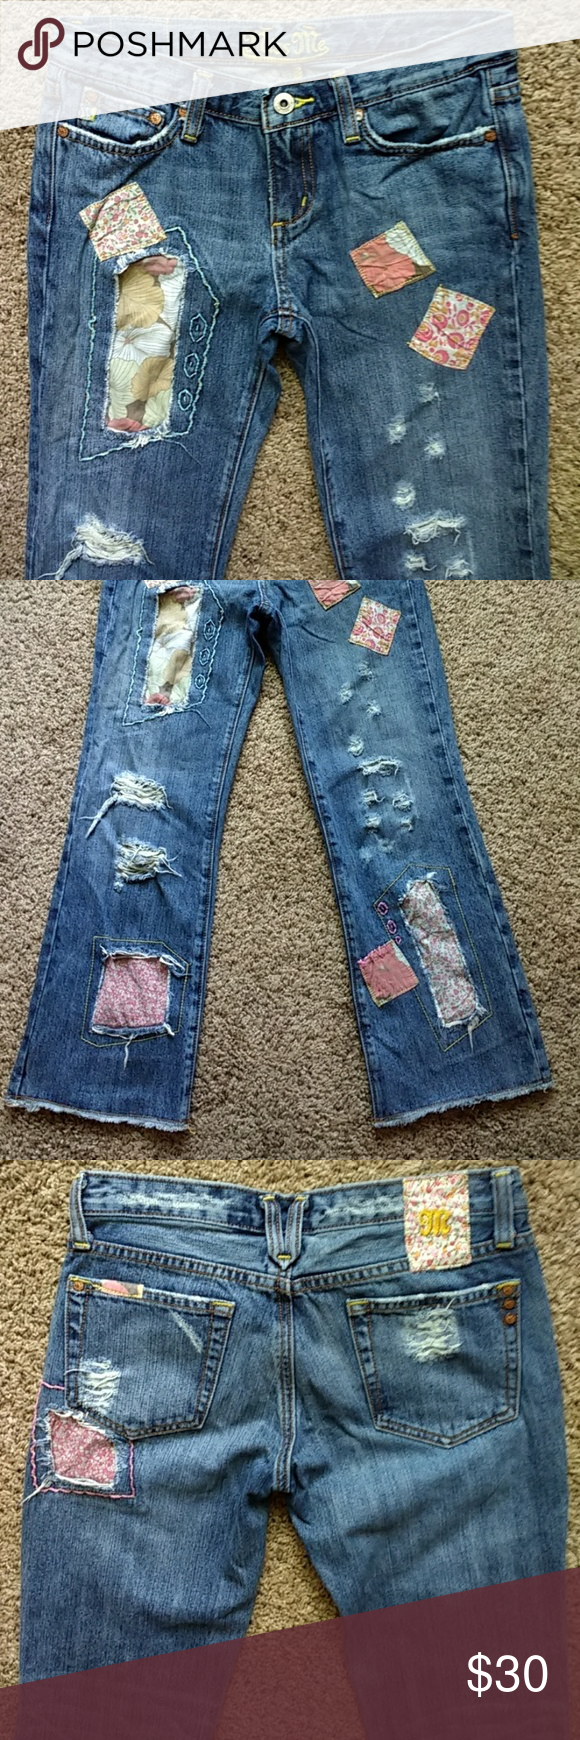 e5a6f34e7ac Miss Me Capri Jeans. Unique style Medium wash 100 percent cotton denim  Capri style jeans semi distressed design with patchwork design behind the  distressed ...